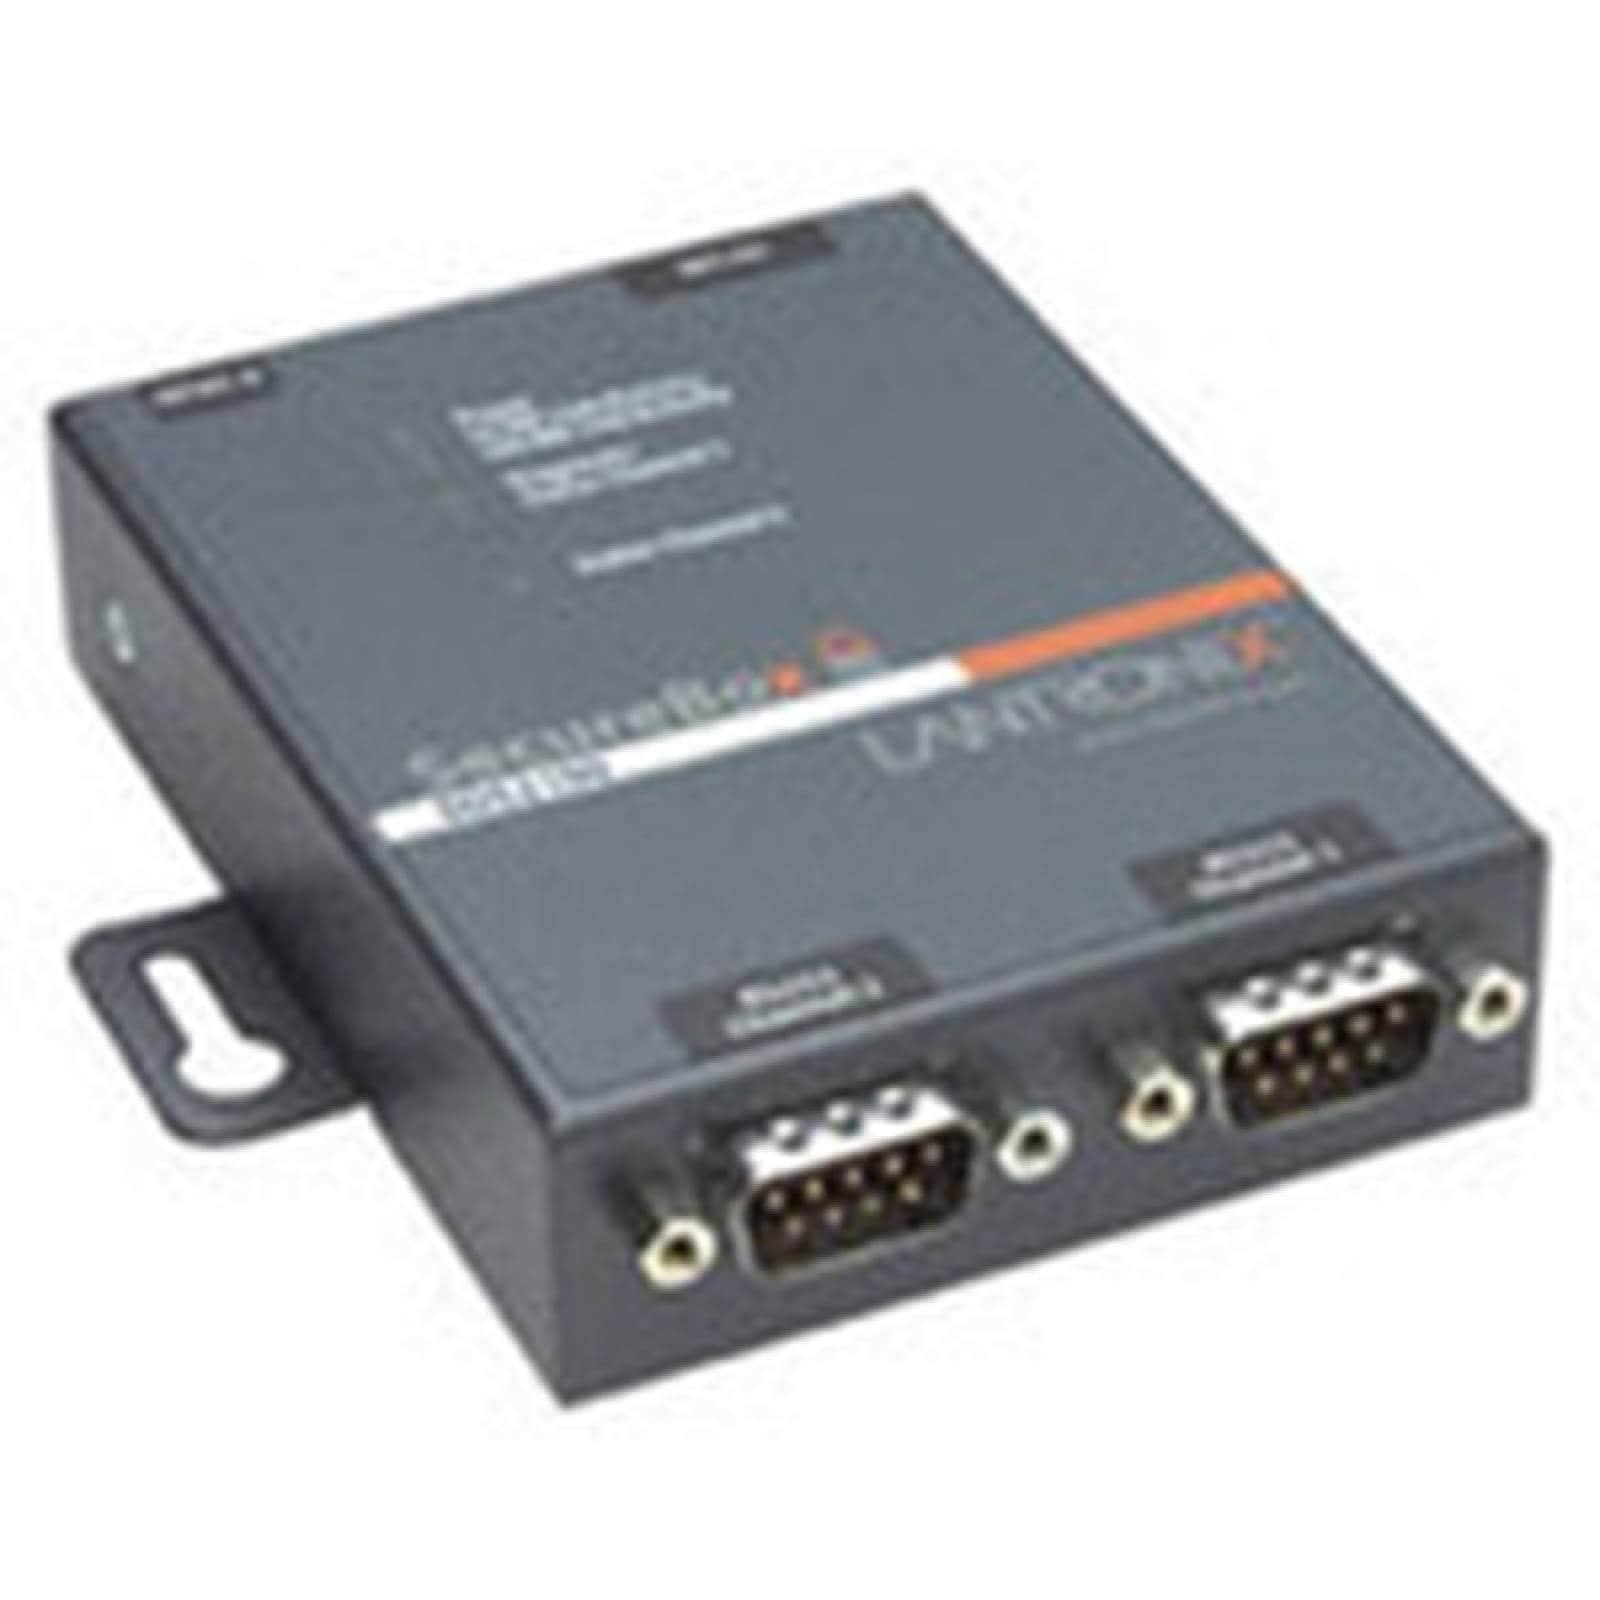 Servidor de dispositivos Lantronix SecureBox SDS2101